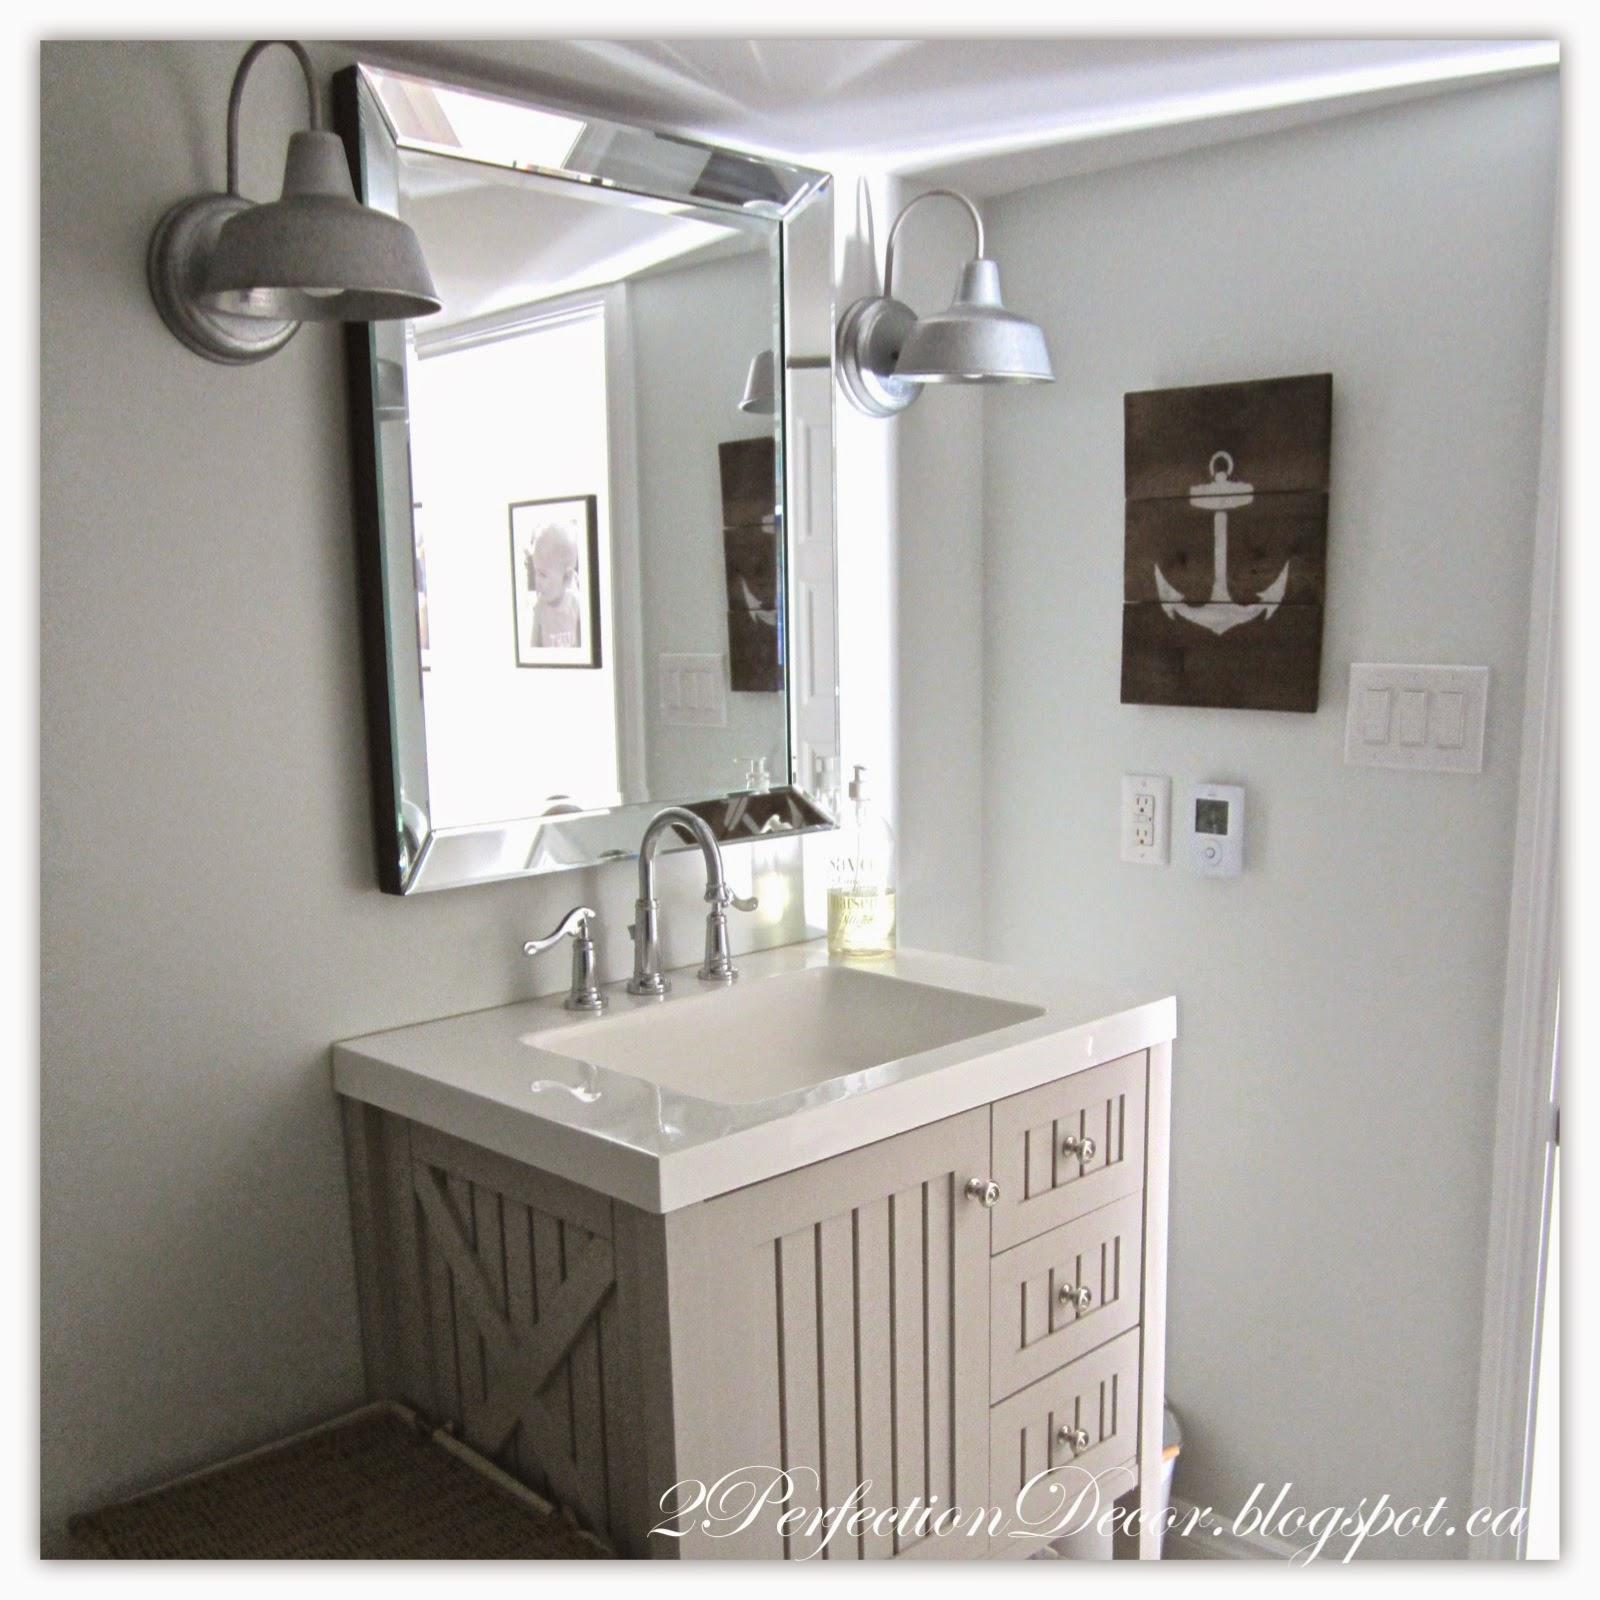 Basement Bathroom Ideas: 2Perfection Decor: Our Basement Reno Full Reveal Recap